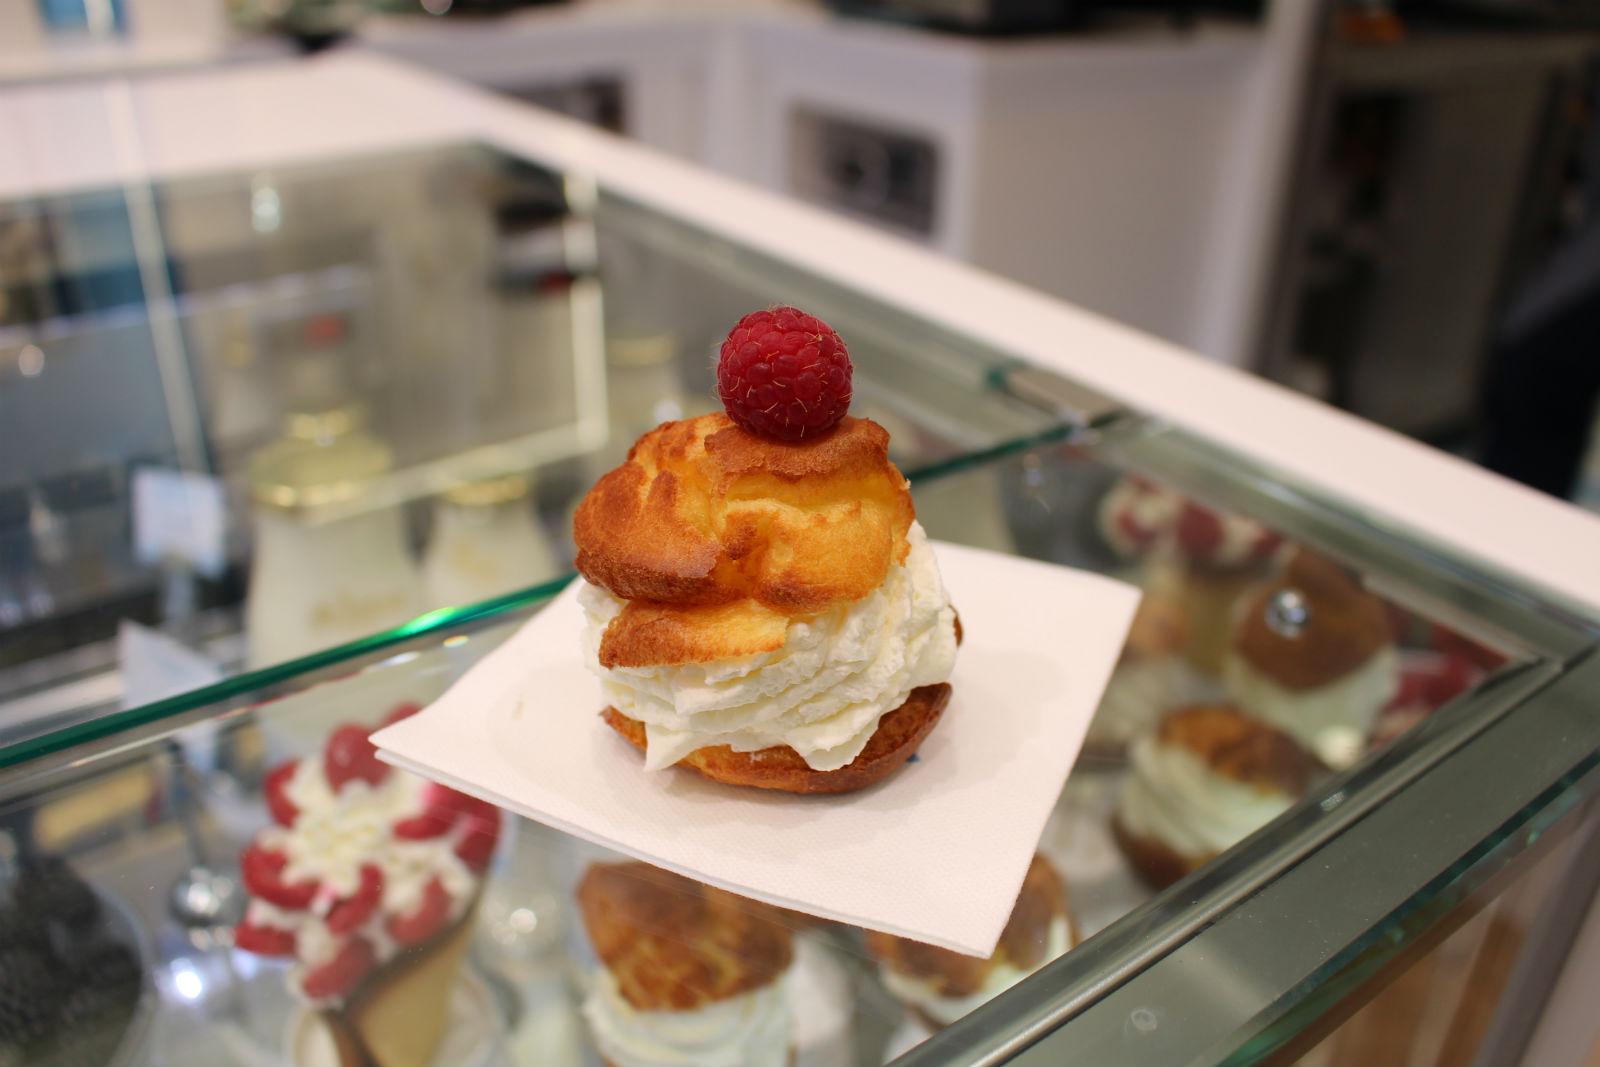 HiP Paris blog. Maison de la Chantilly. Choux filled with cream right before your eyes